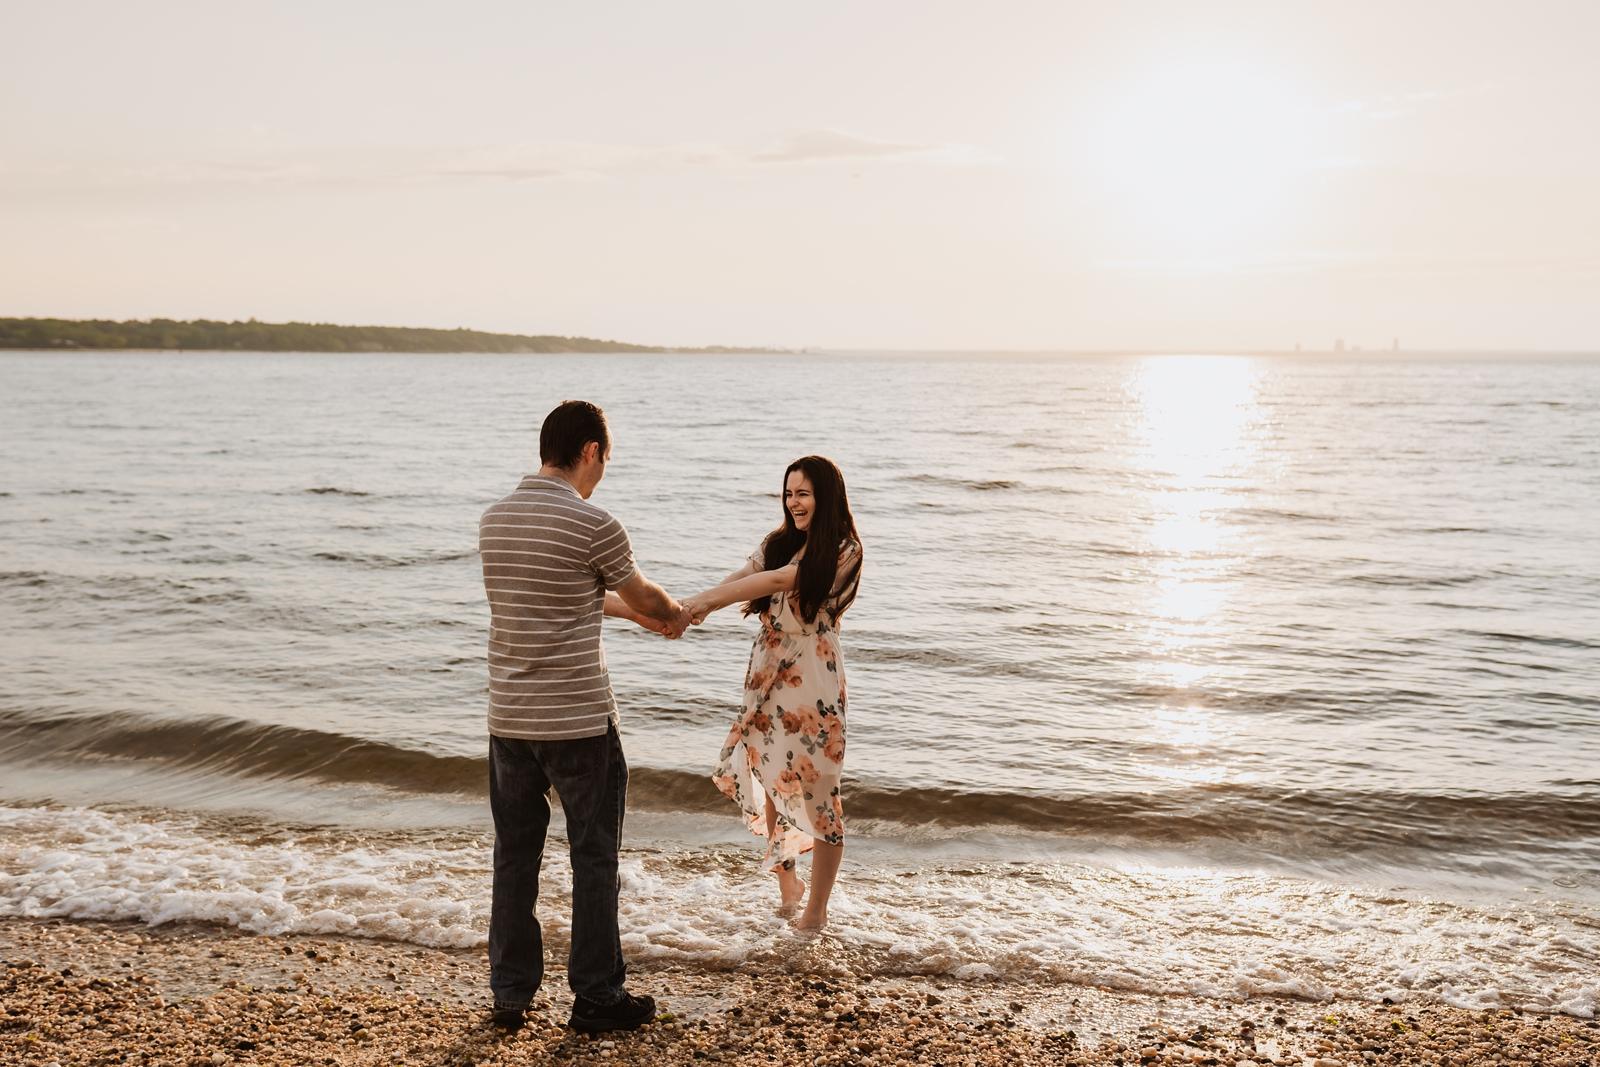 Ashley_James_Engagement_Morgan Park_Glen Cove_Sneak-May 20, 2019-8_blog.jpg